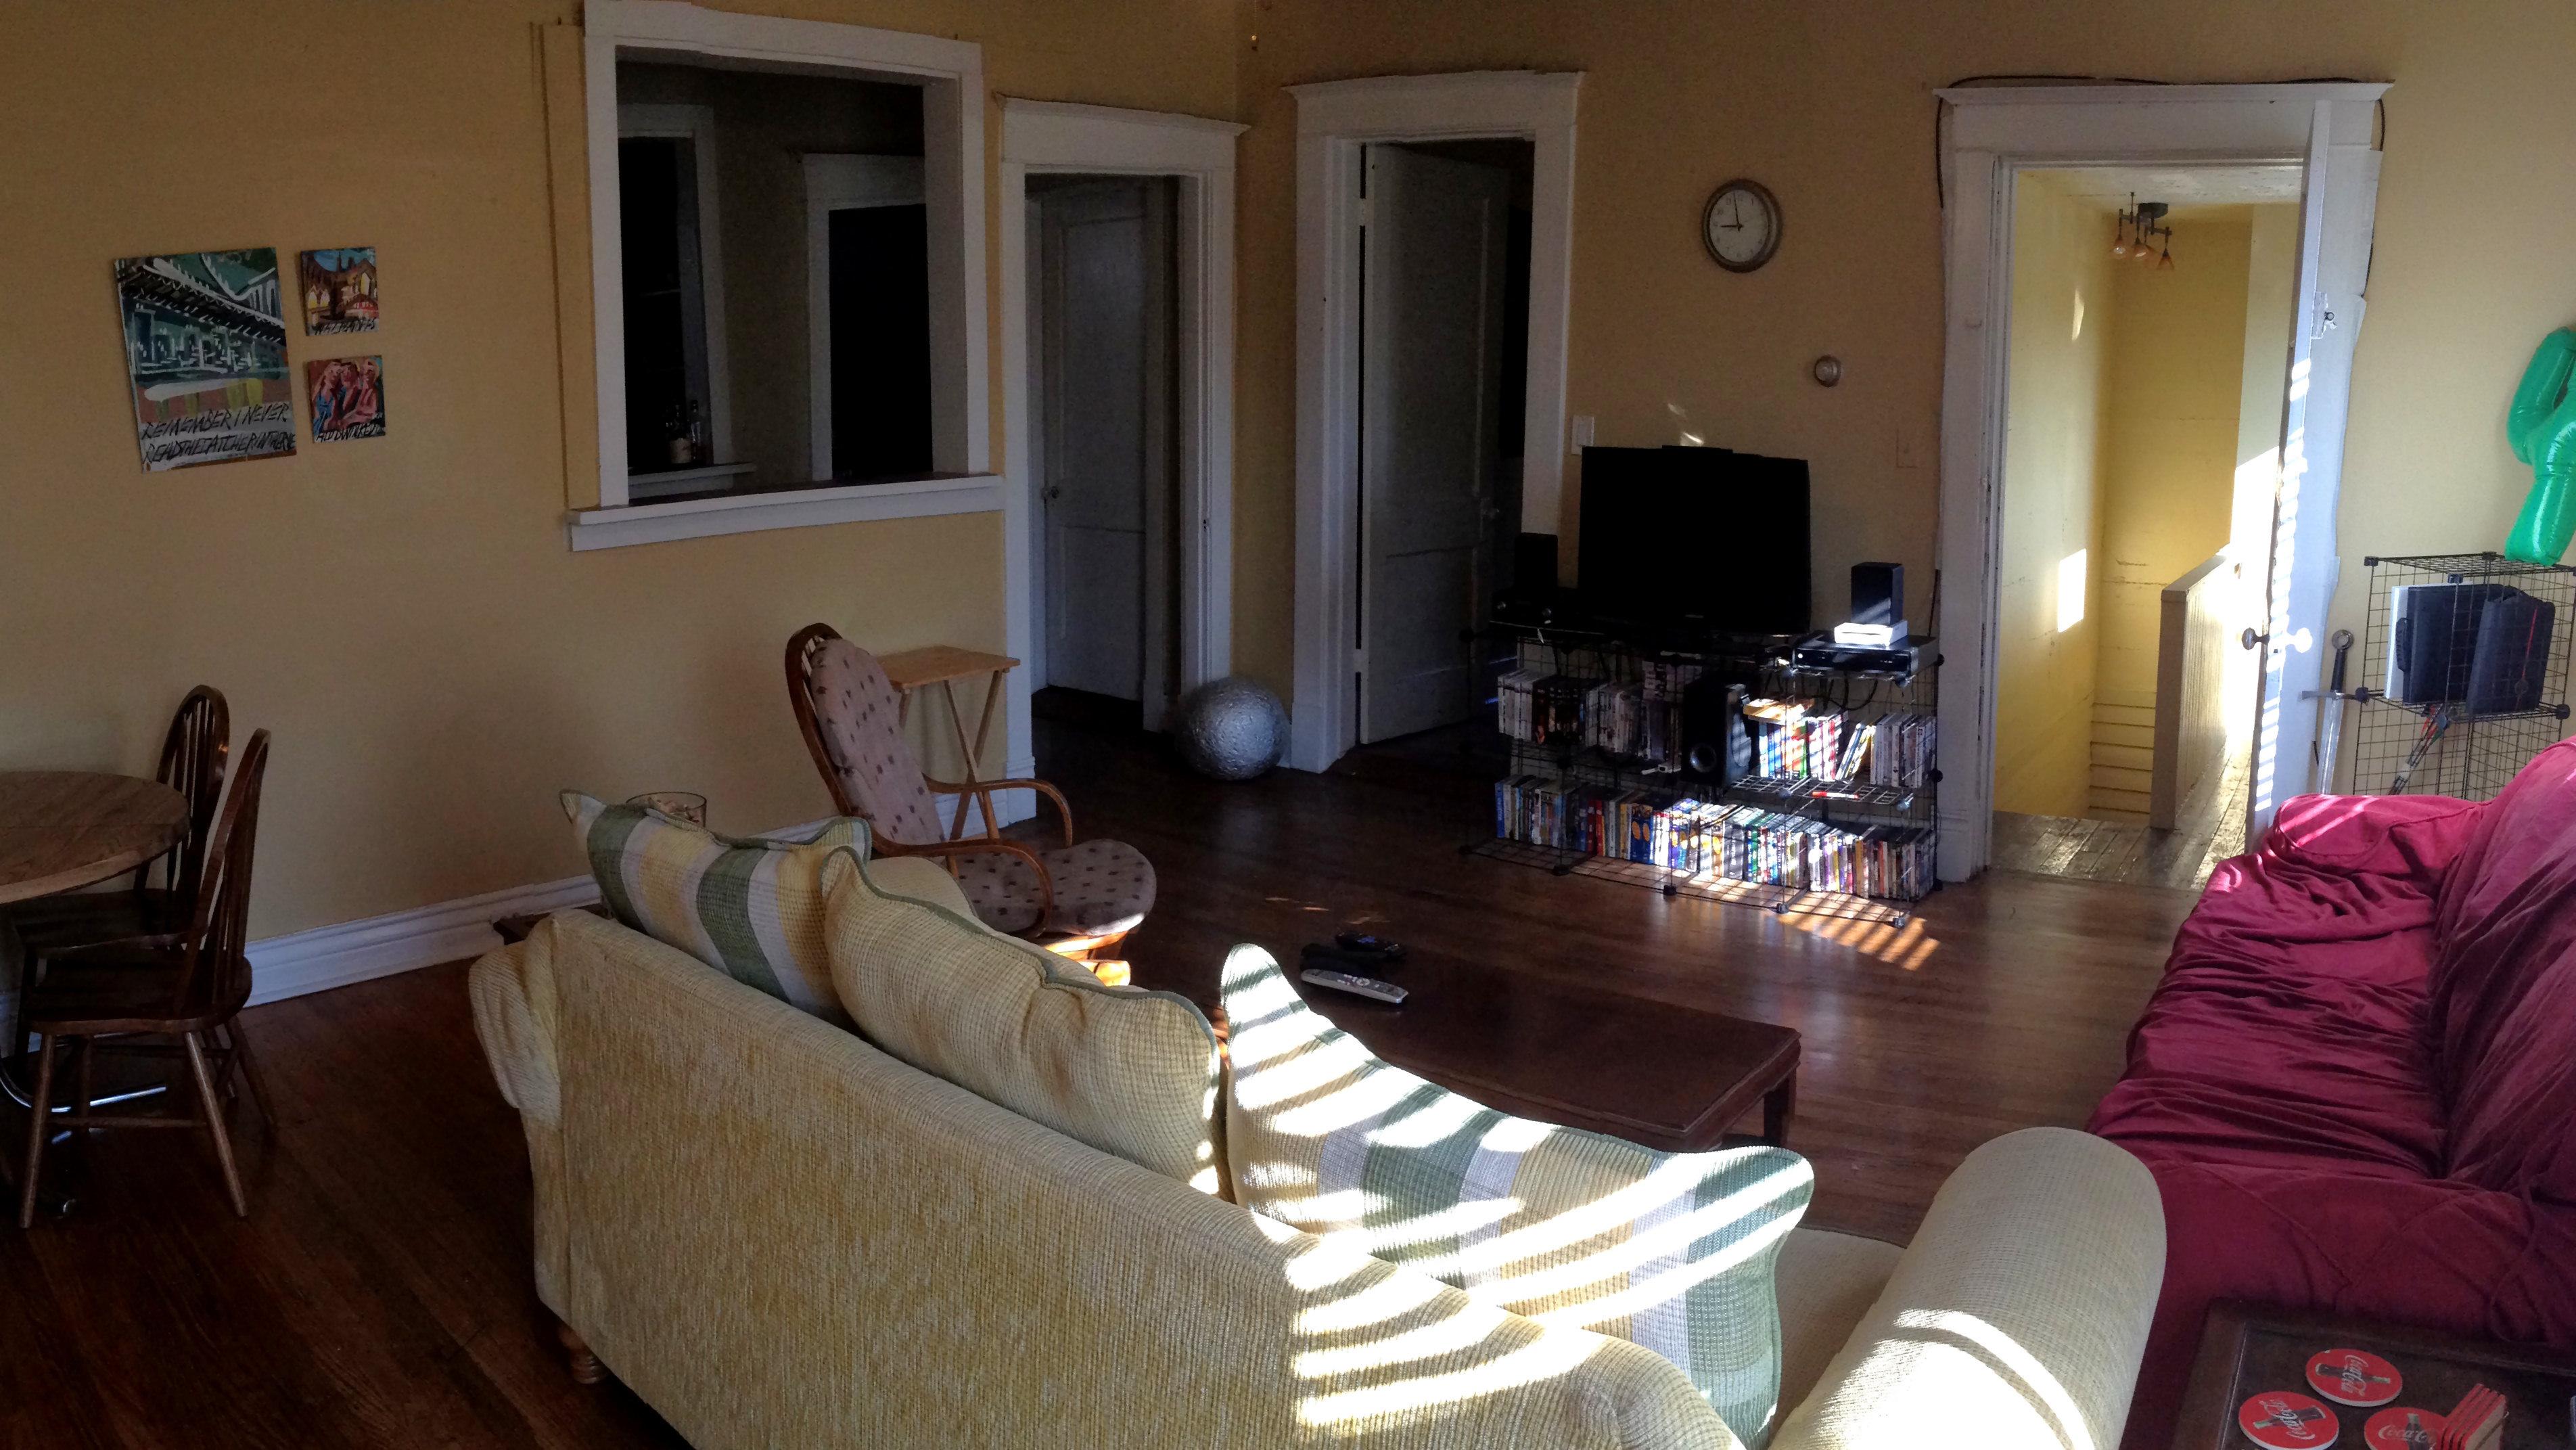 Roommate Needed 7 25 1500 Sq Ft Duplex Highlands 399